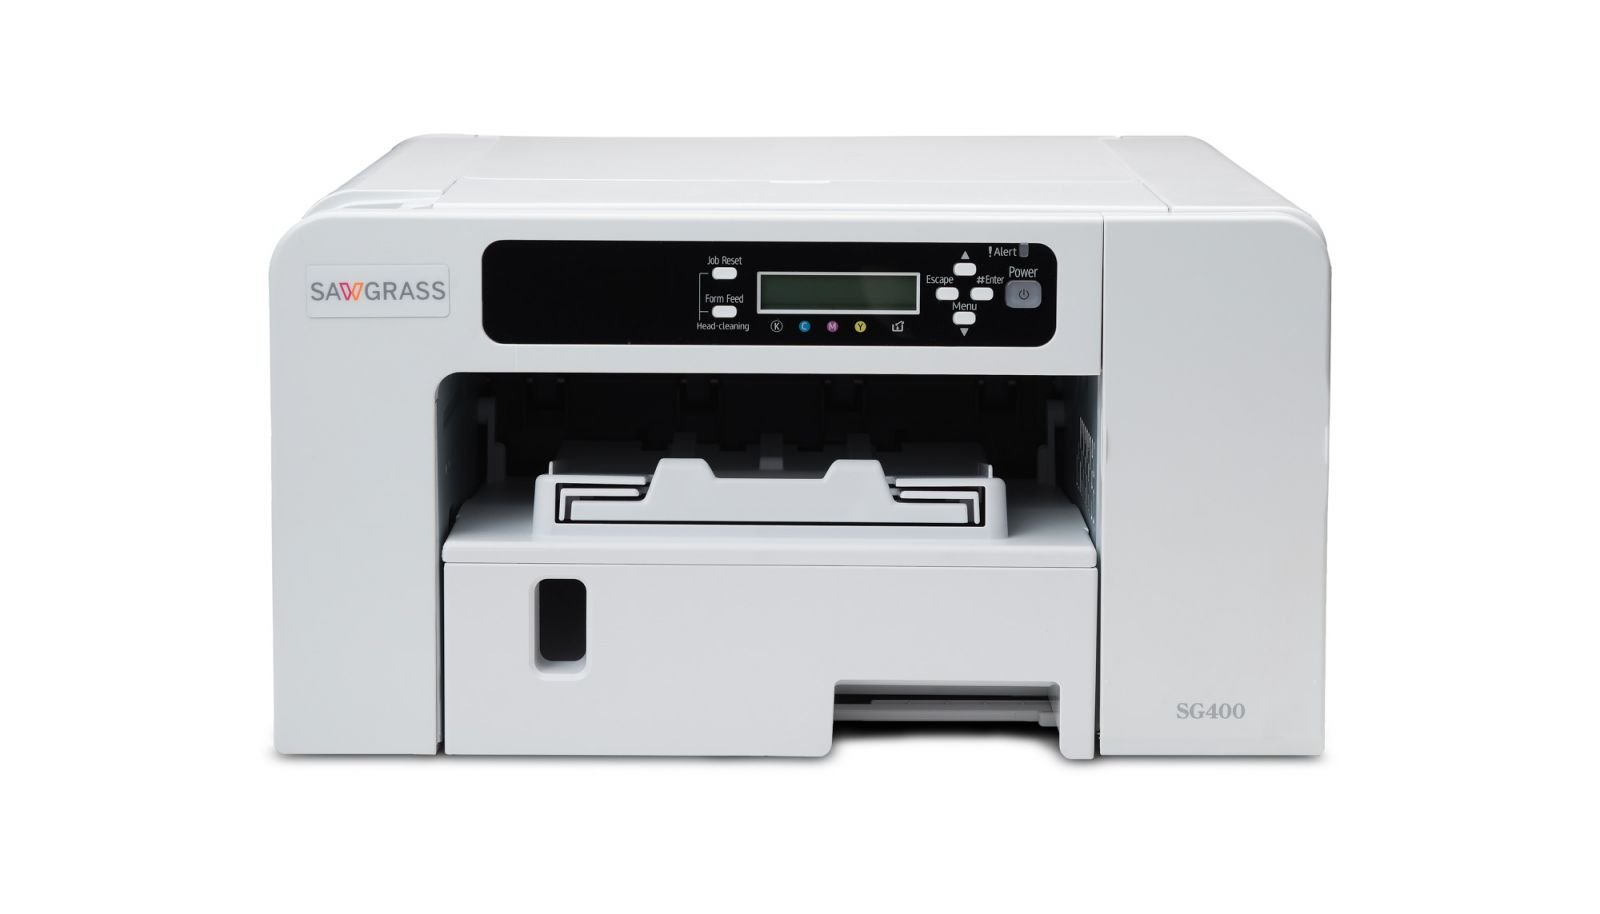 Sawgrass SG 400 A4 Sistem